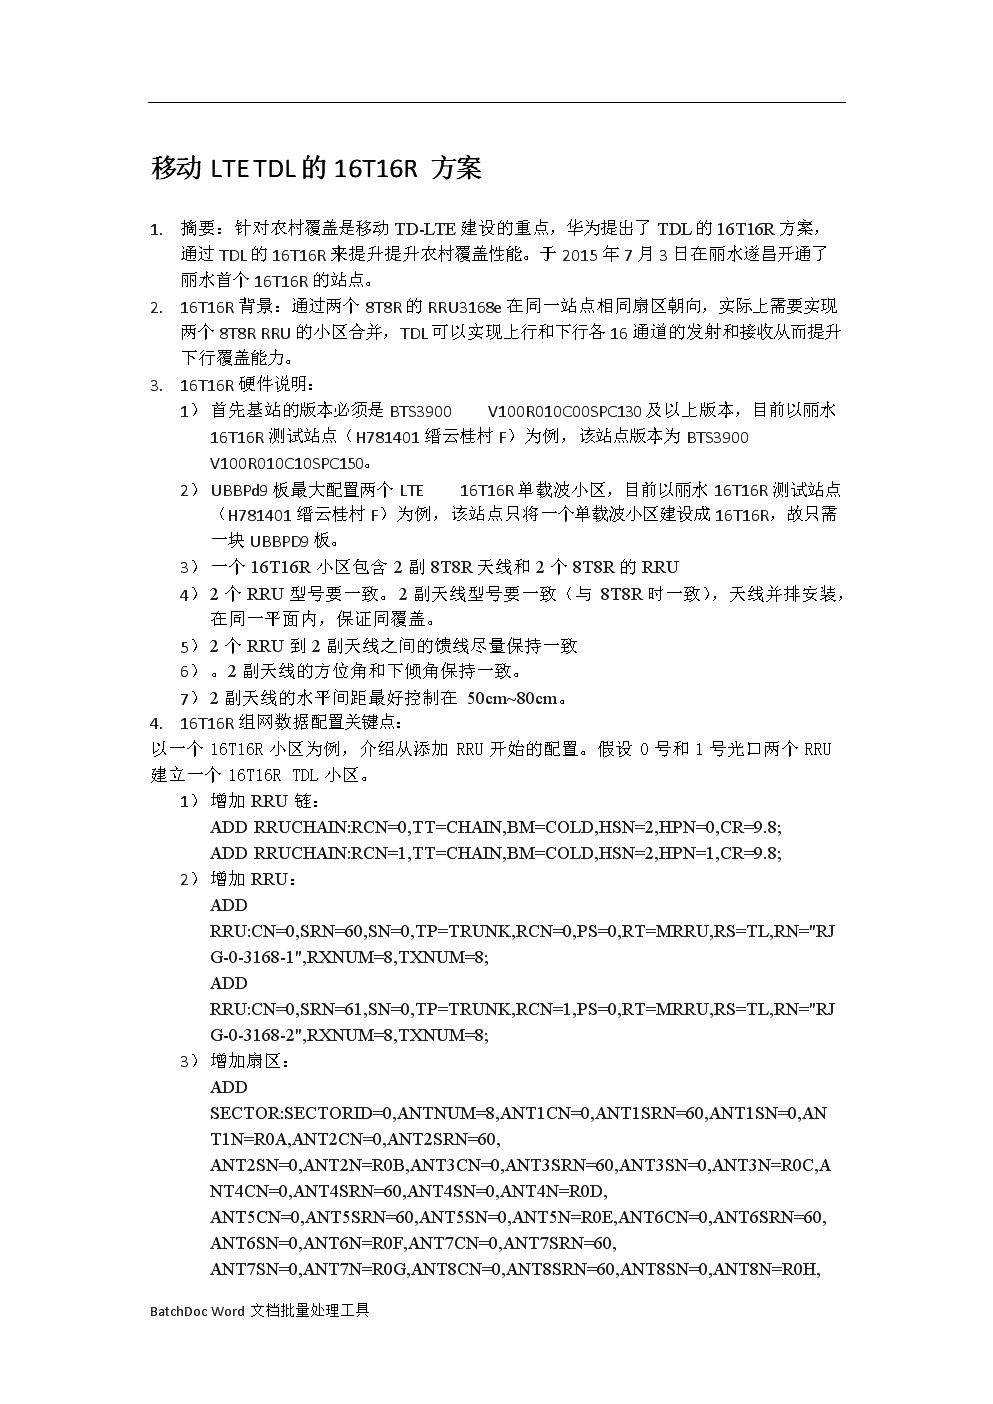 16T16R开站案例-通信技术参考资料.docx